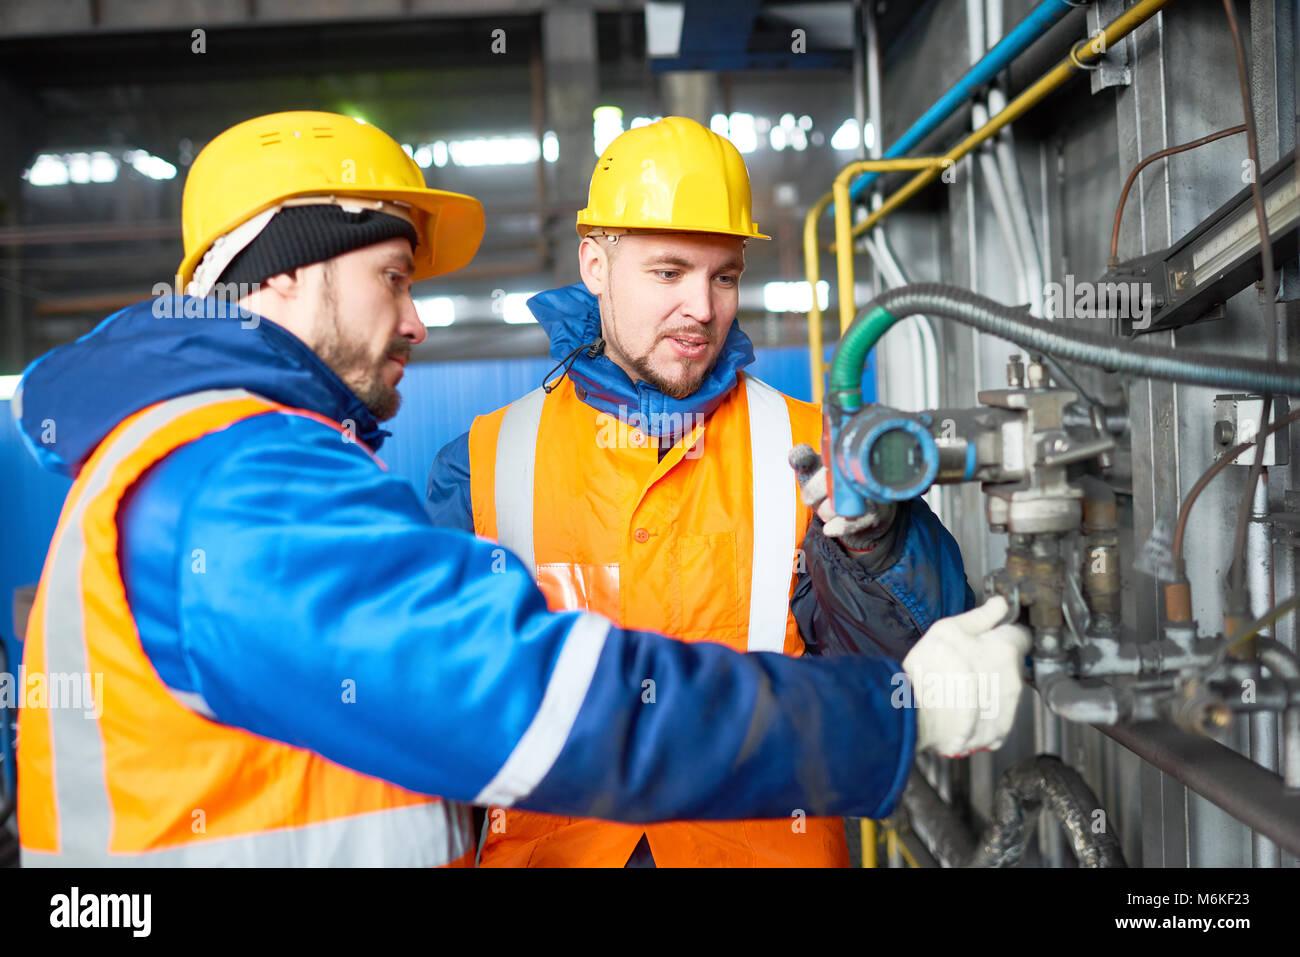 Team Adjusting Equipment - Stock Image